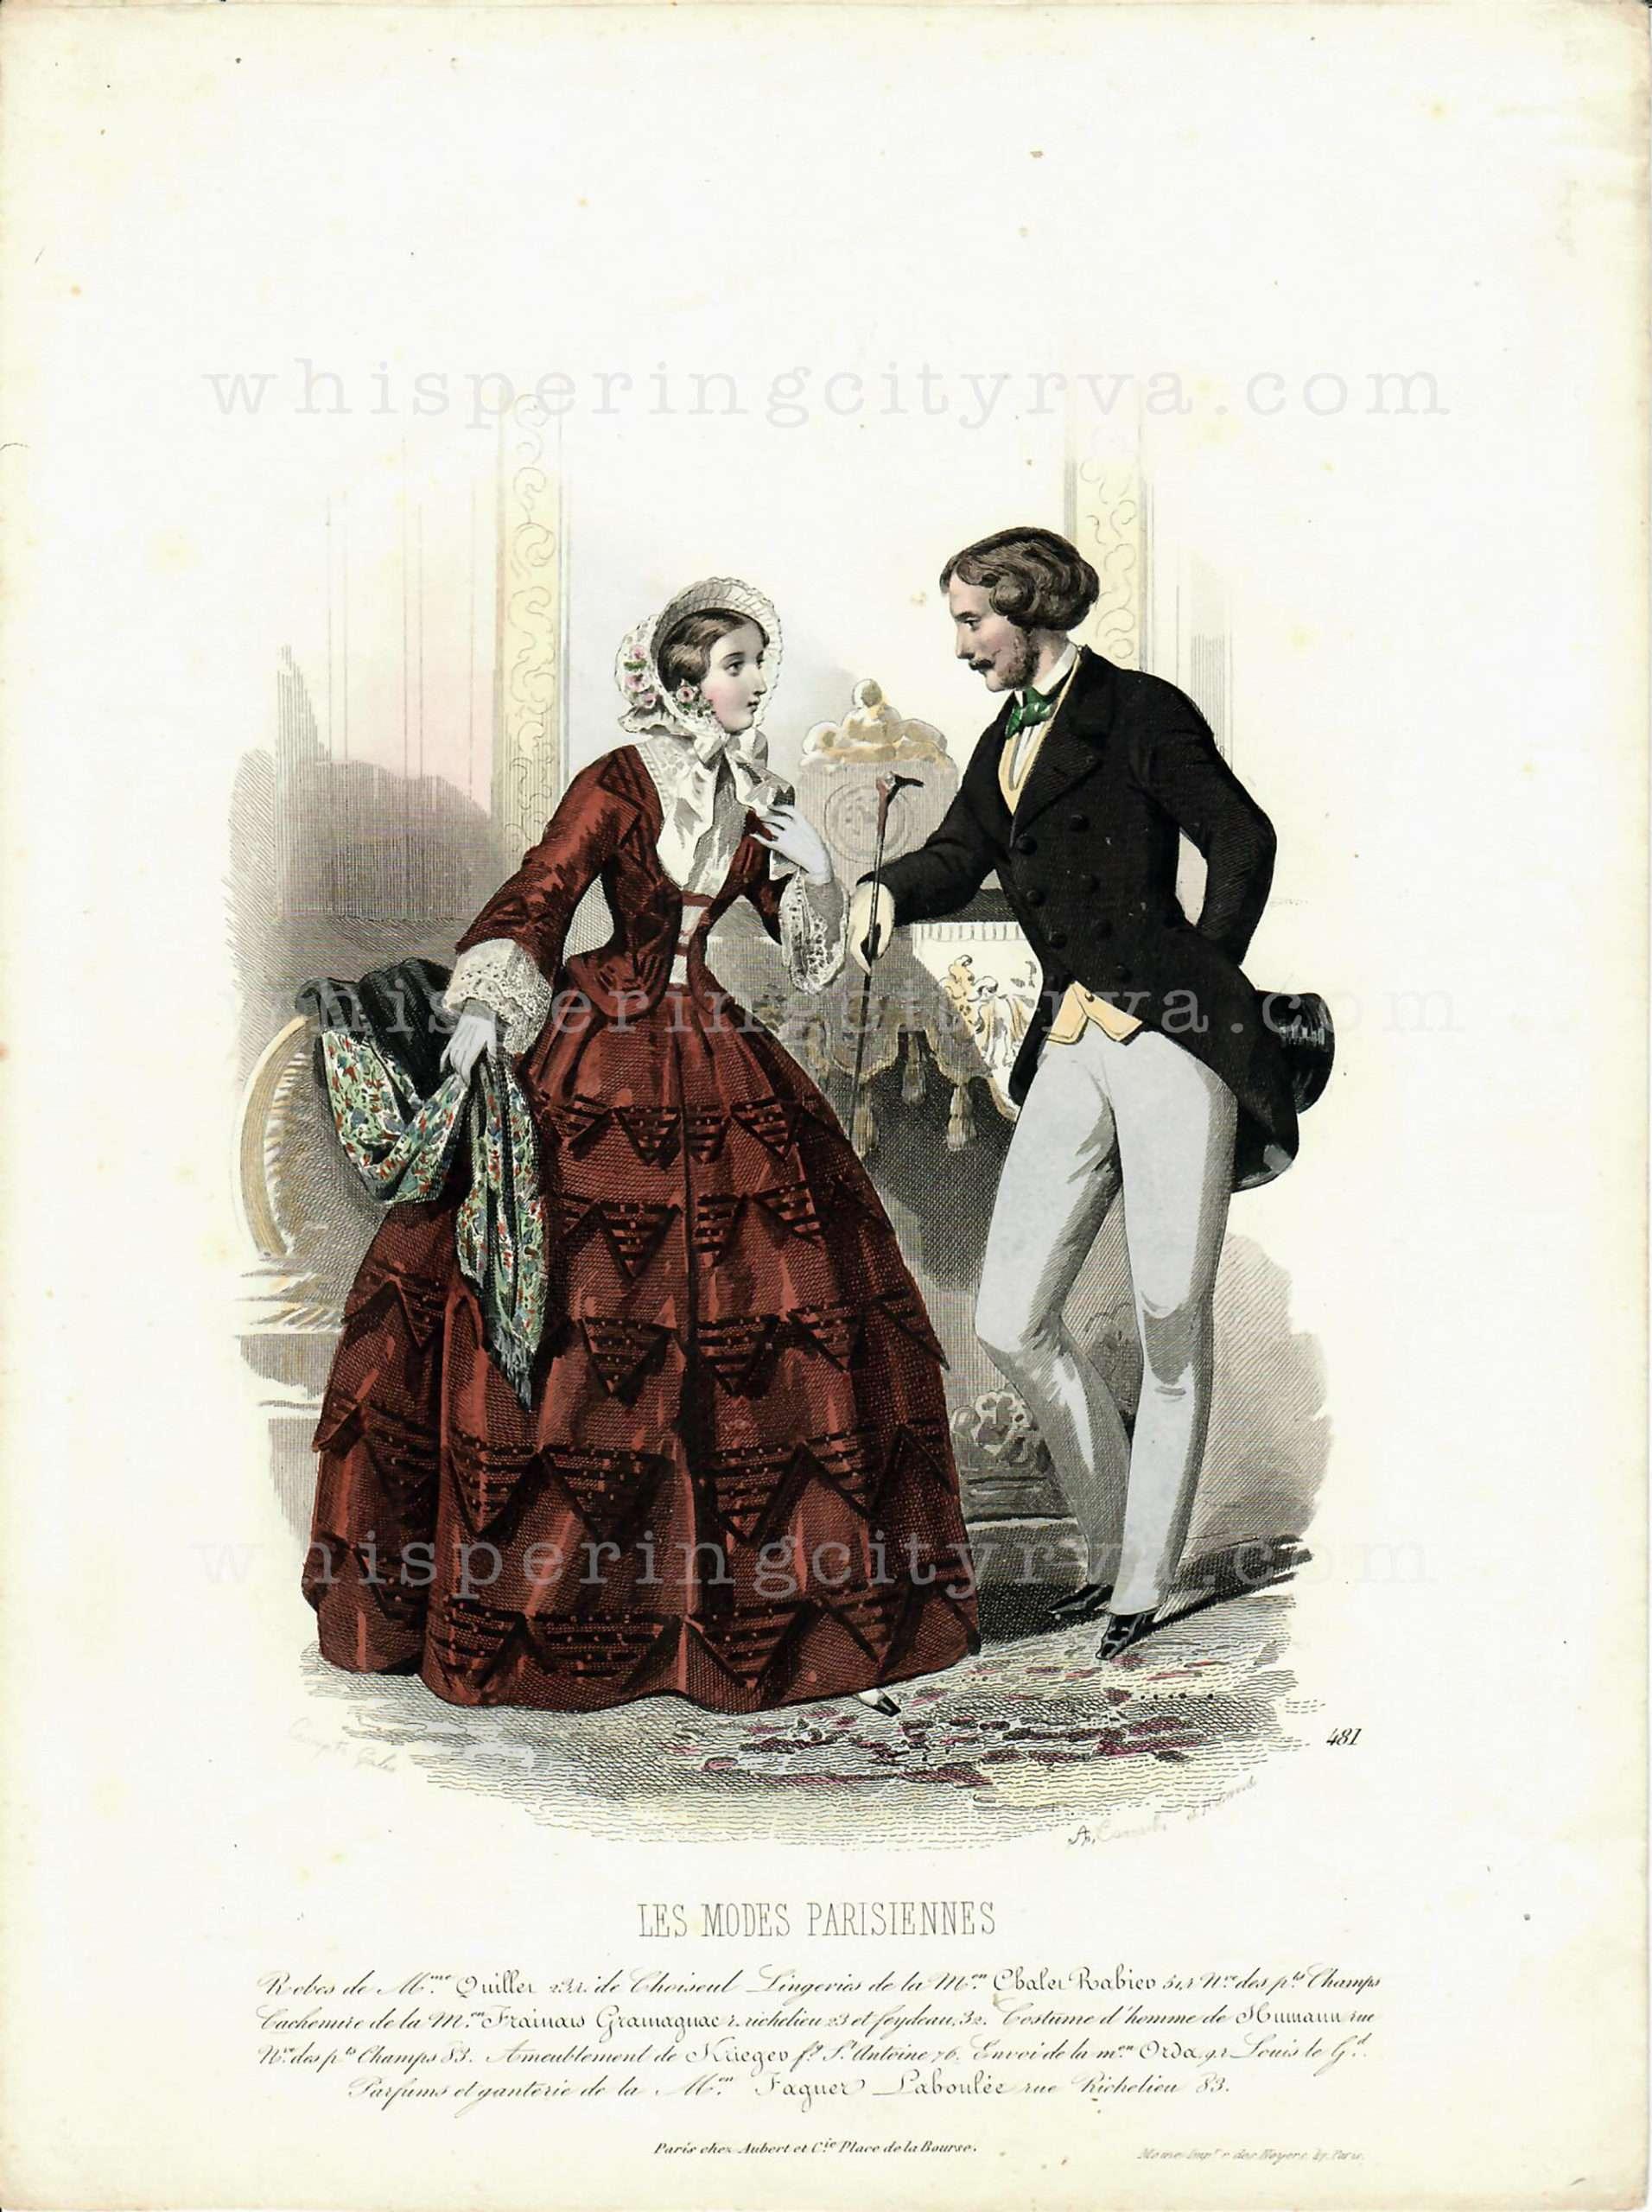 Antique Colored Engraving – Les Modes Parisiennes c. 1860 | Whispering City RVA